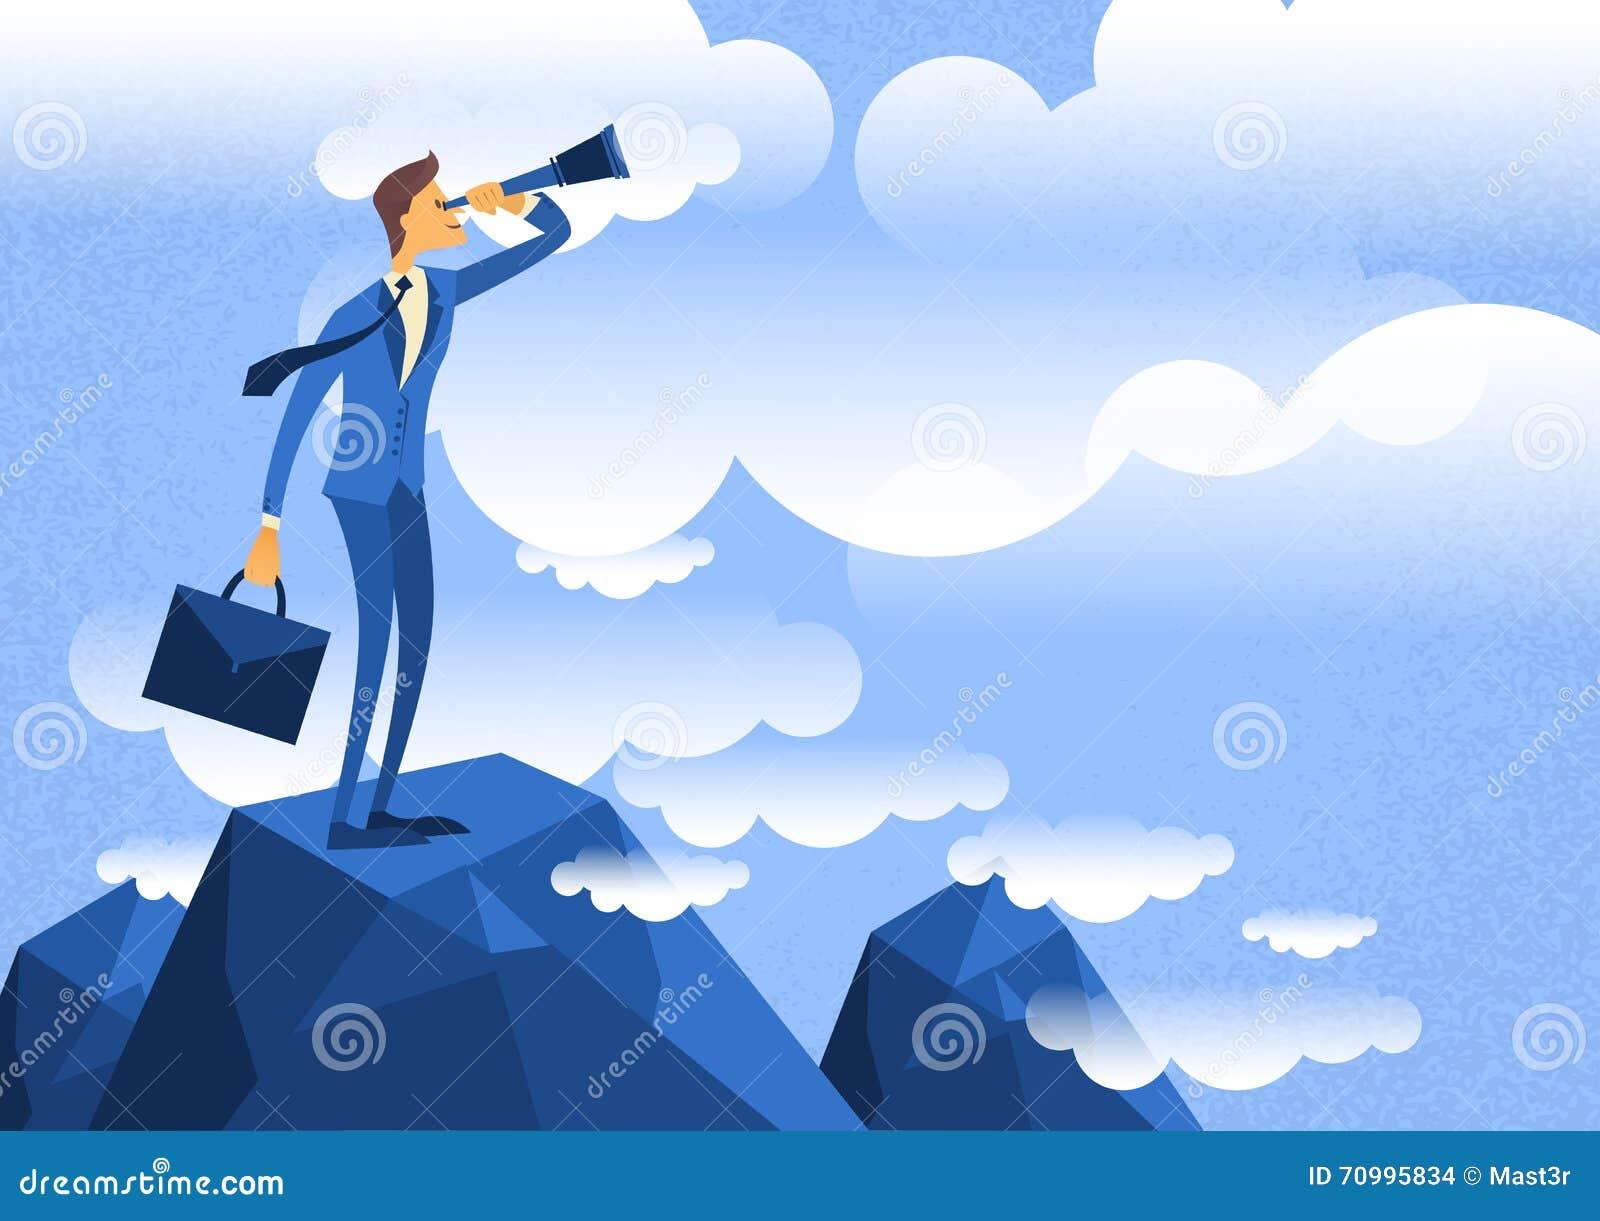 Cartoon Characters Looking Forward : Cartoon businessman looking through telescope standing on